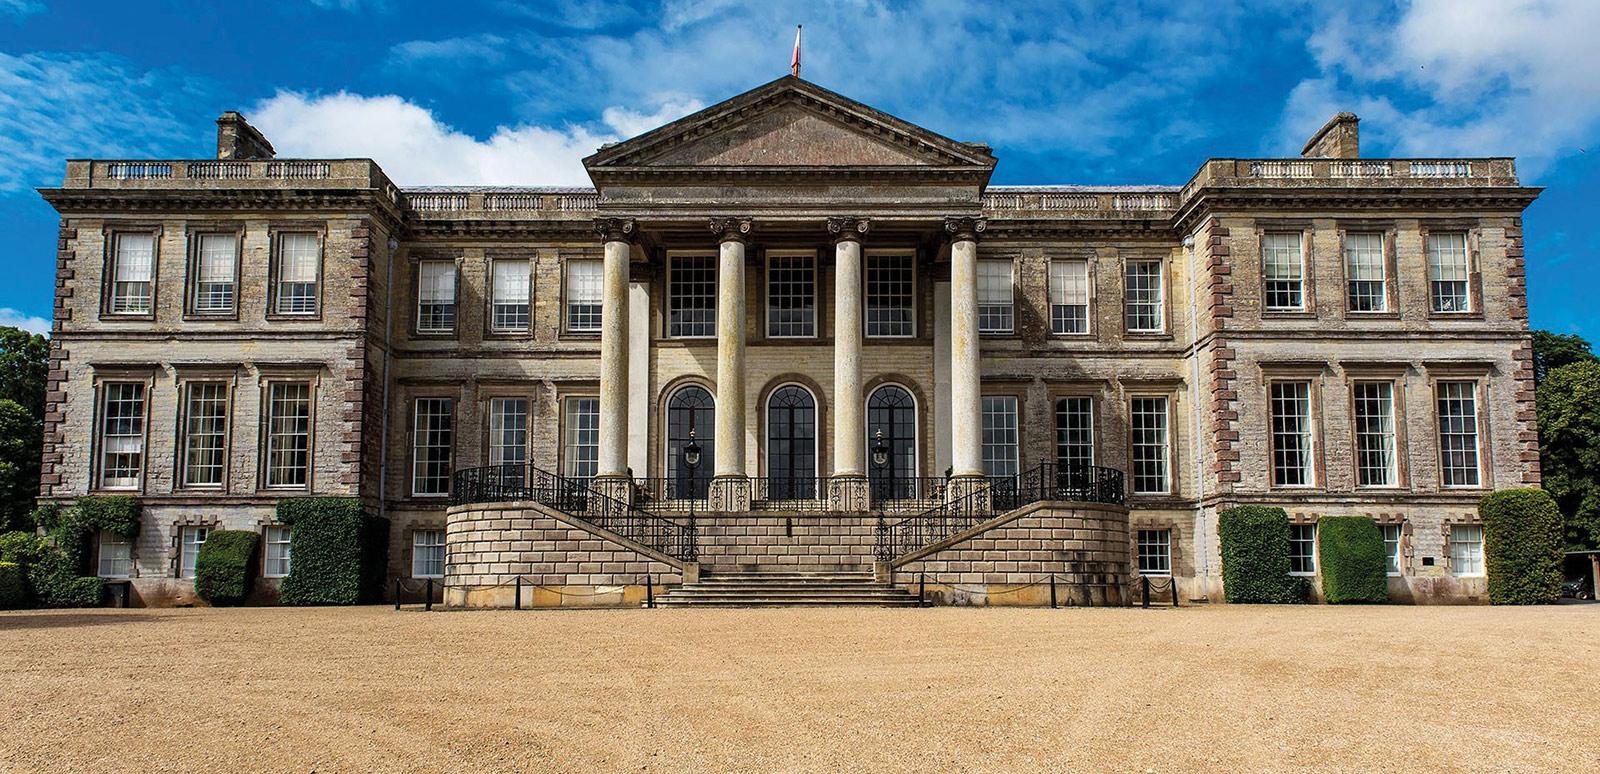 Ragley Hall, Stratford-upon-Avon